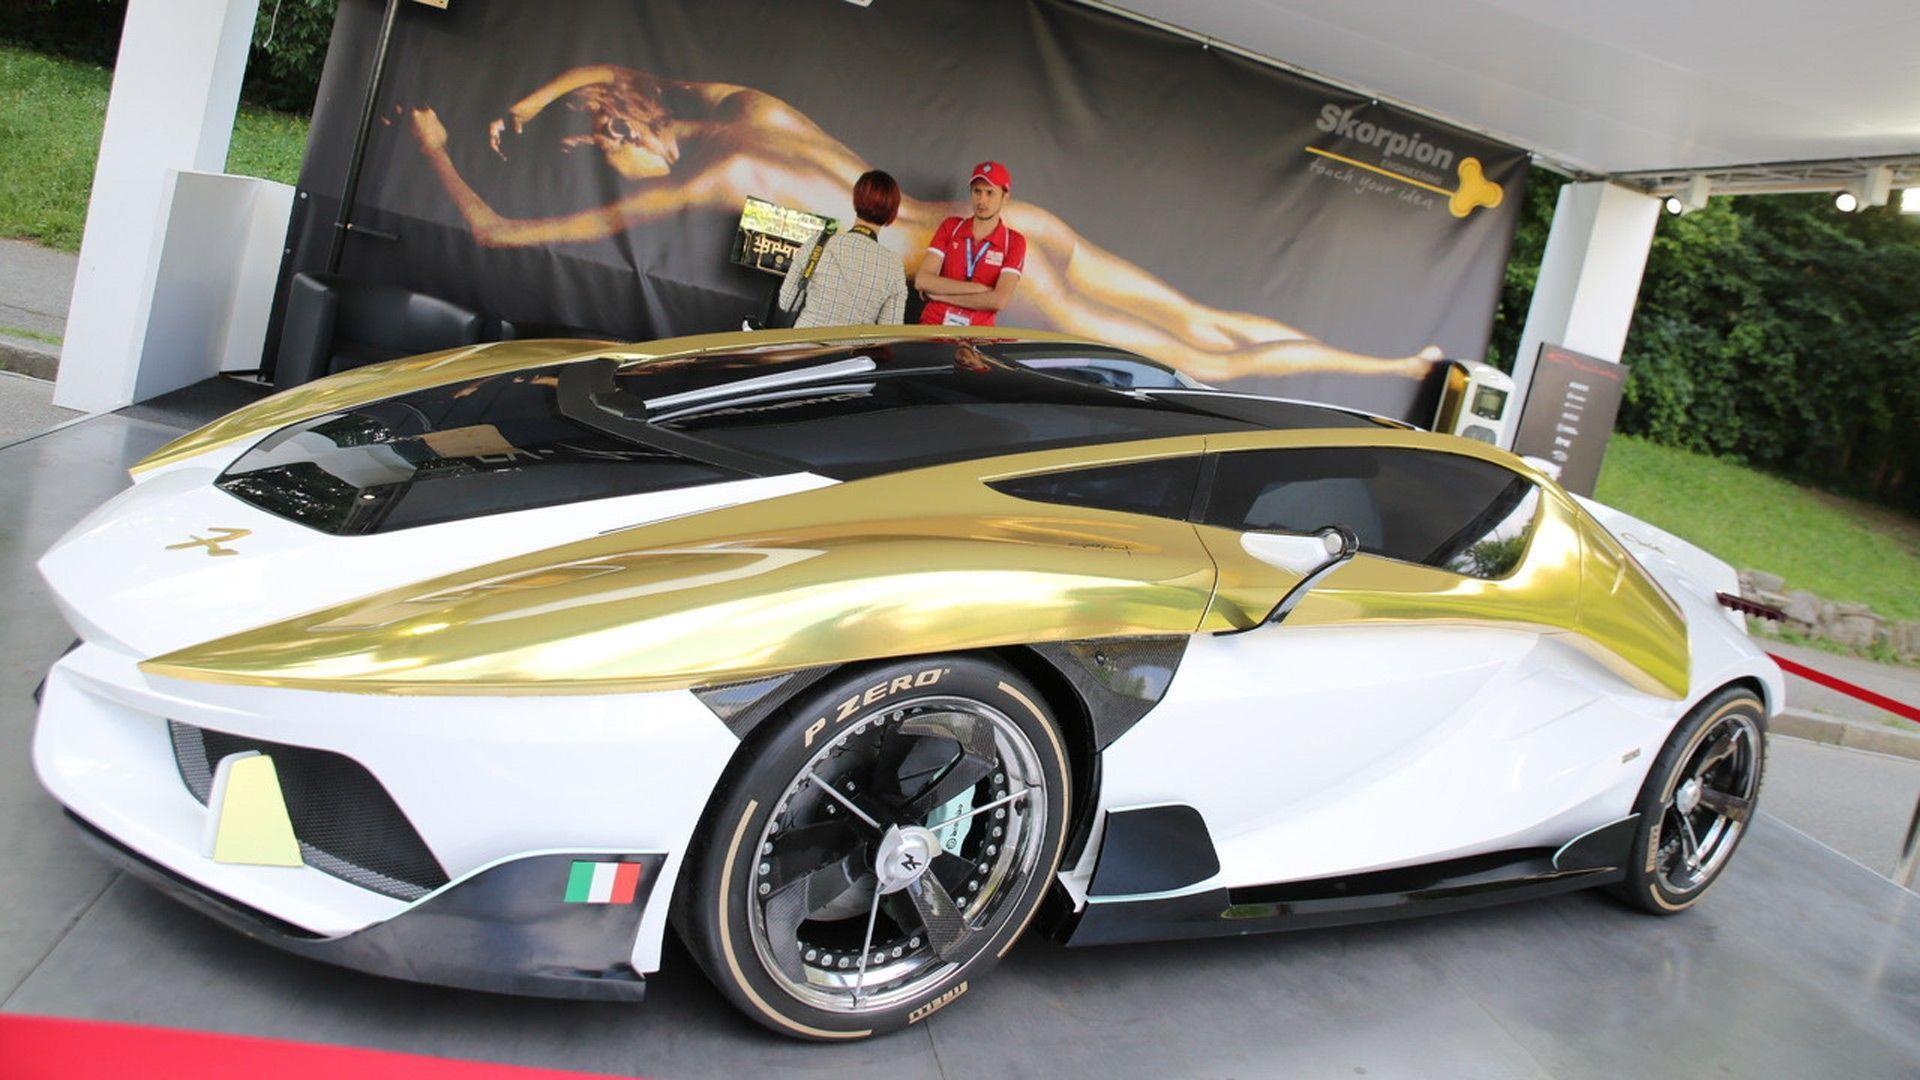 Frangivento Asfané Charlotte Roadster - Image via Motor1